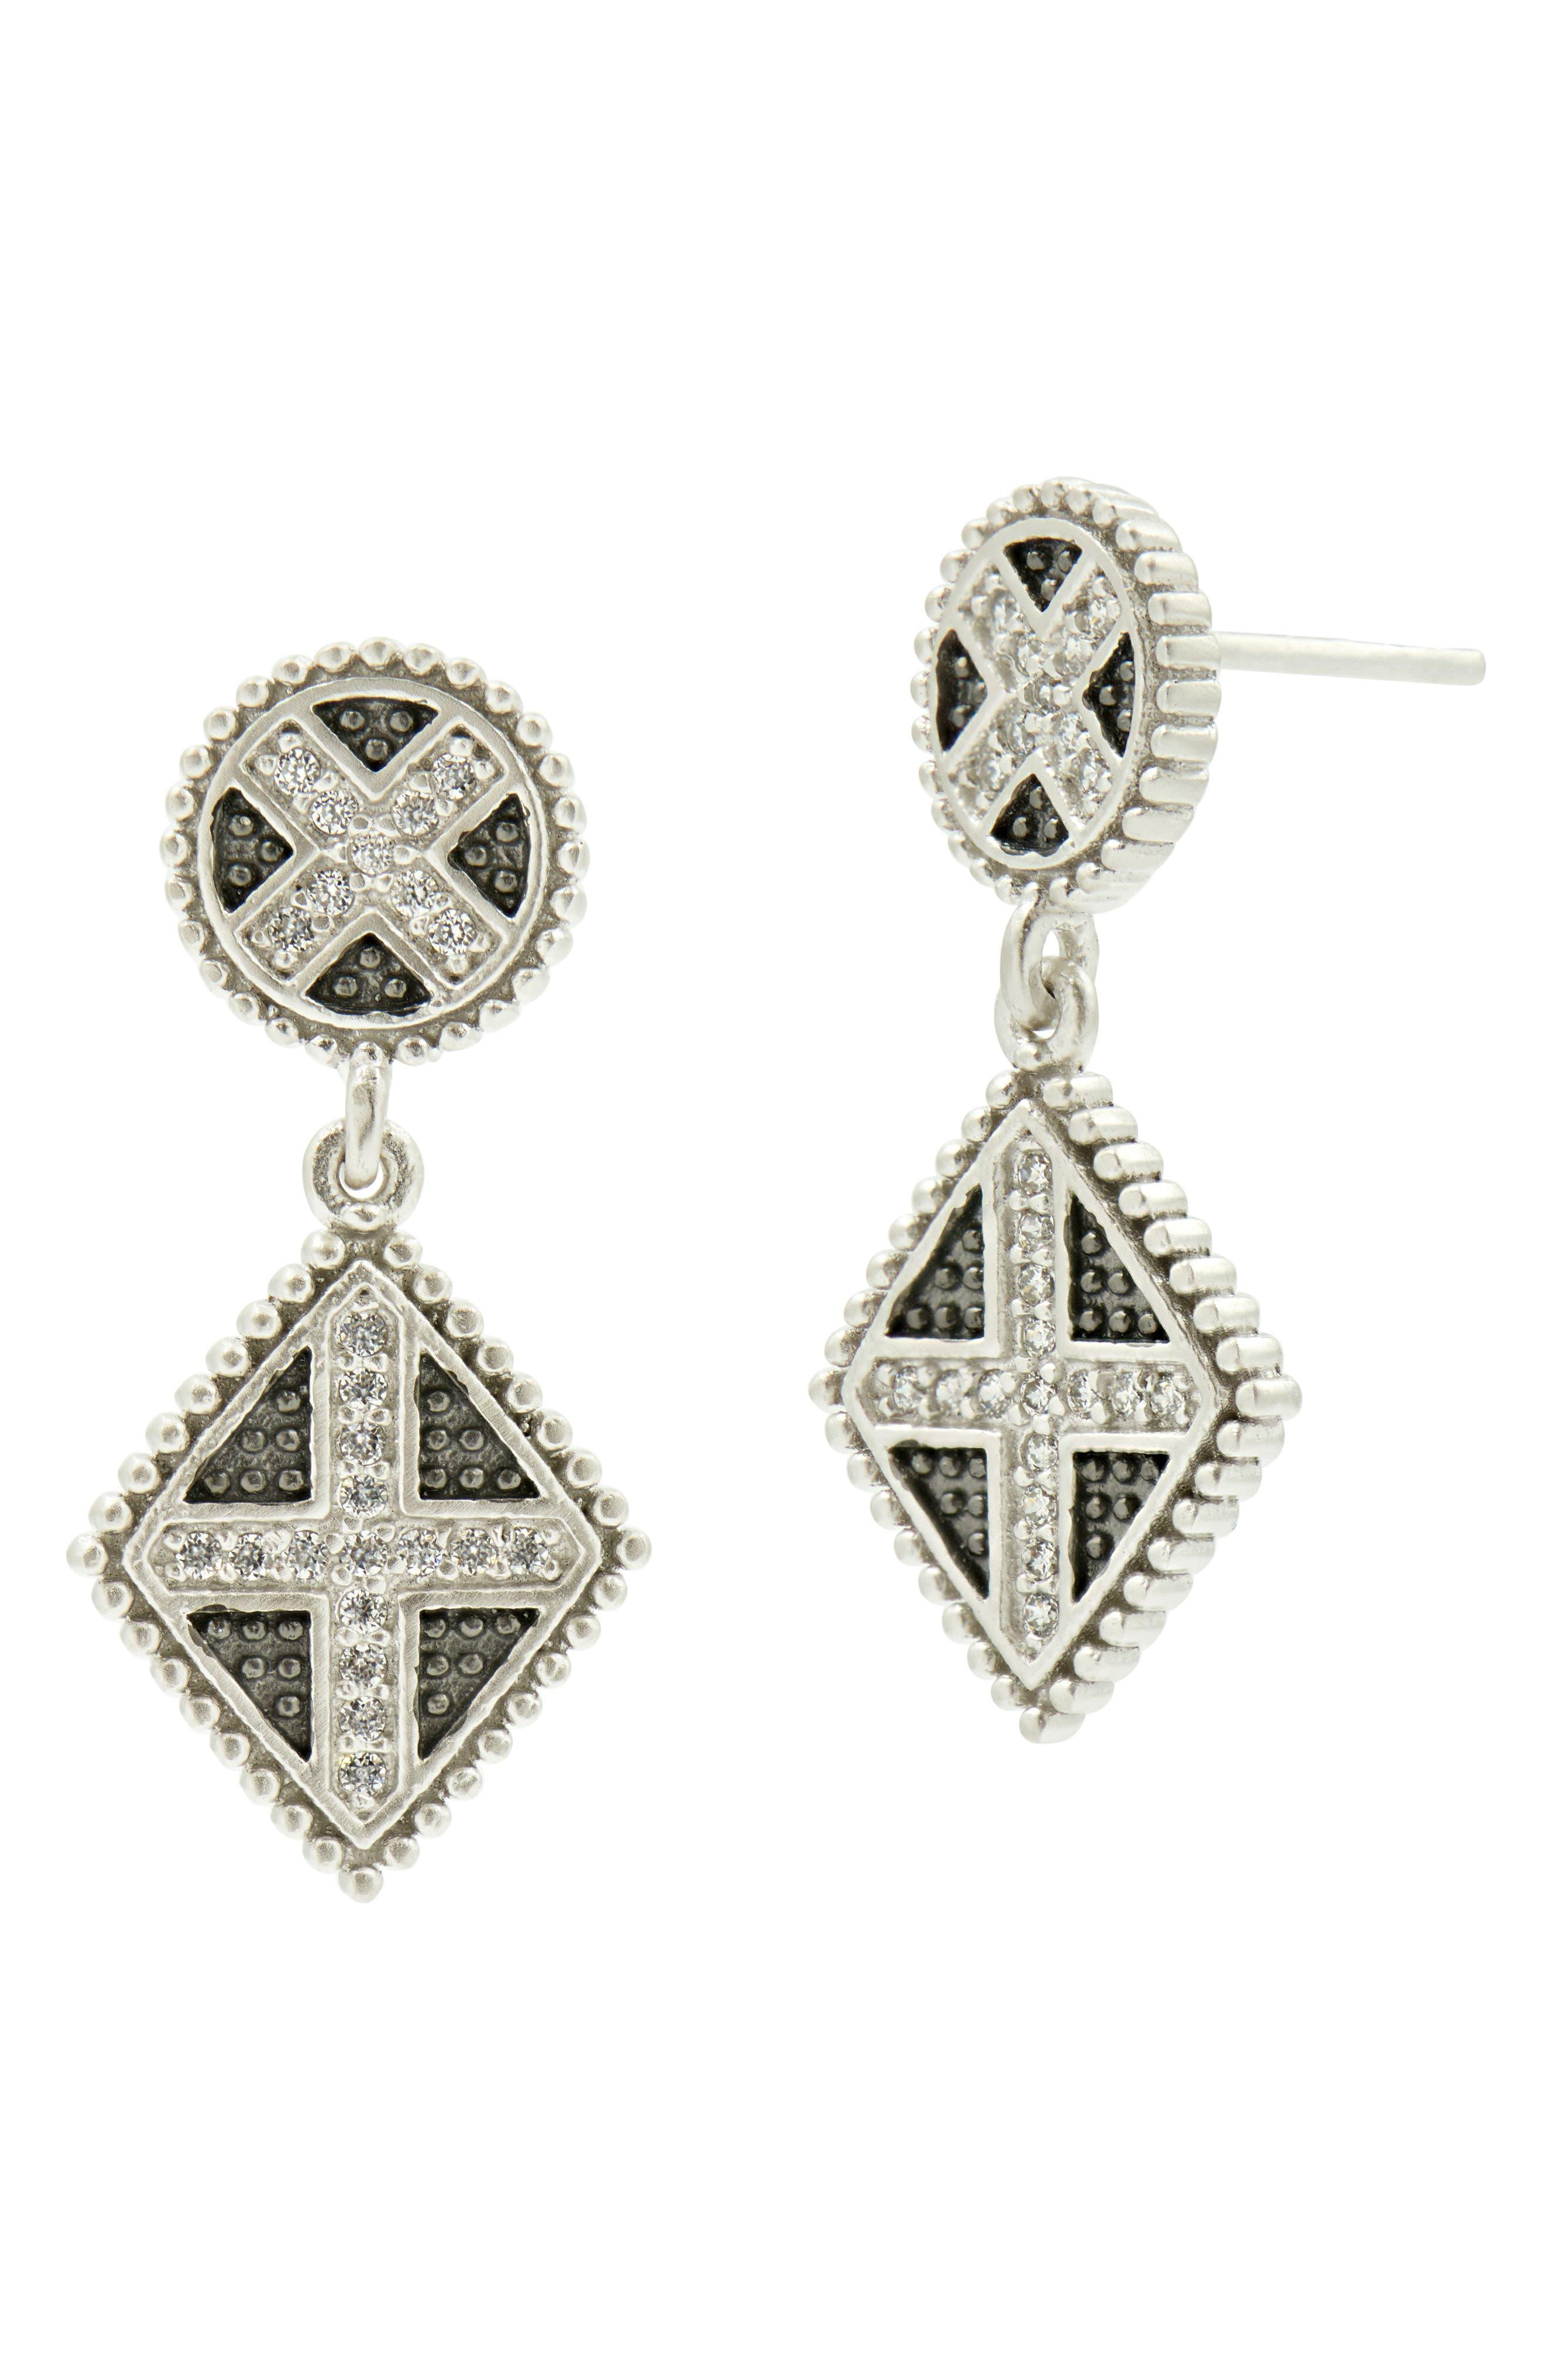 Industrial Finish Double Drop Earrings,                             Main thumbnail 1, color,                             Silver/ Black Rhodium